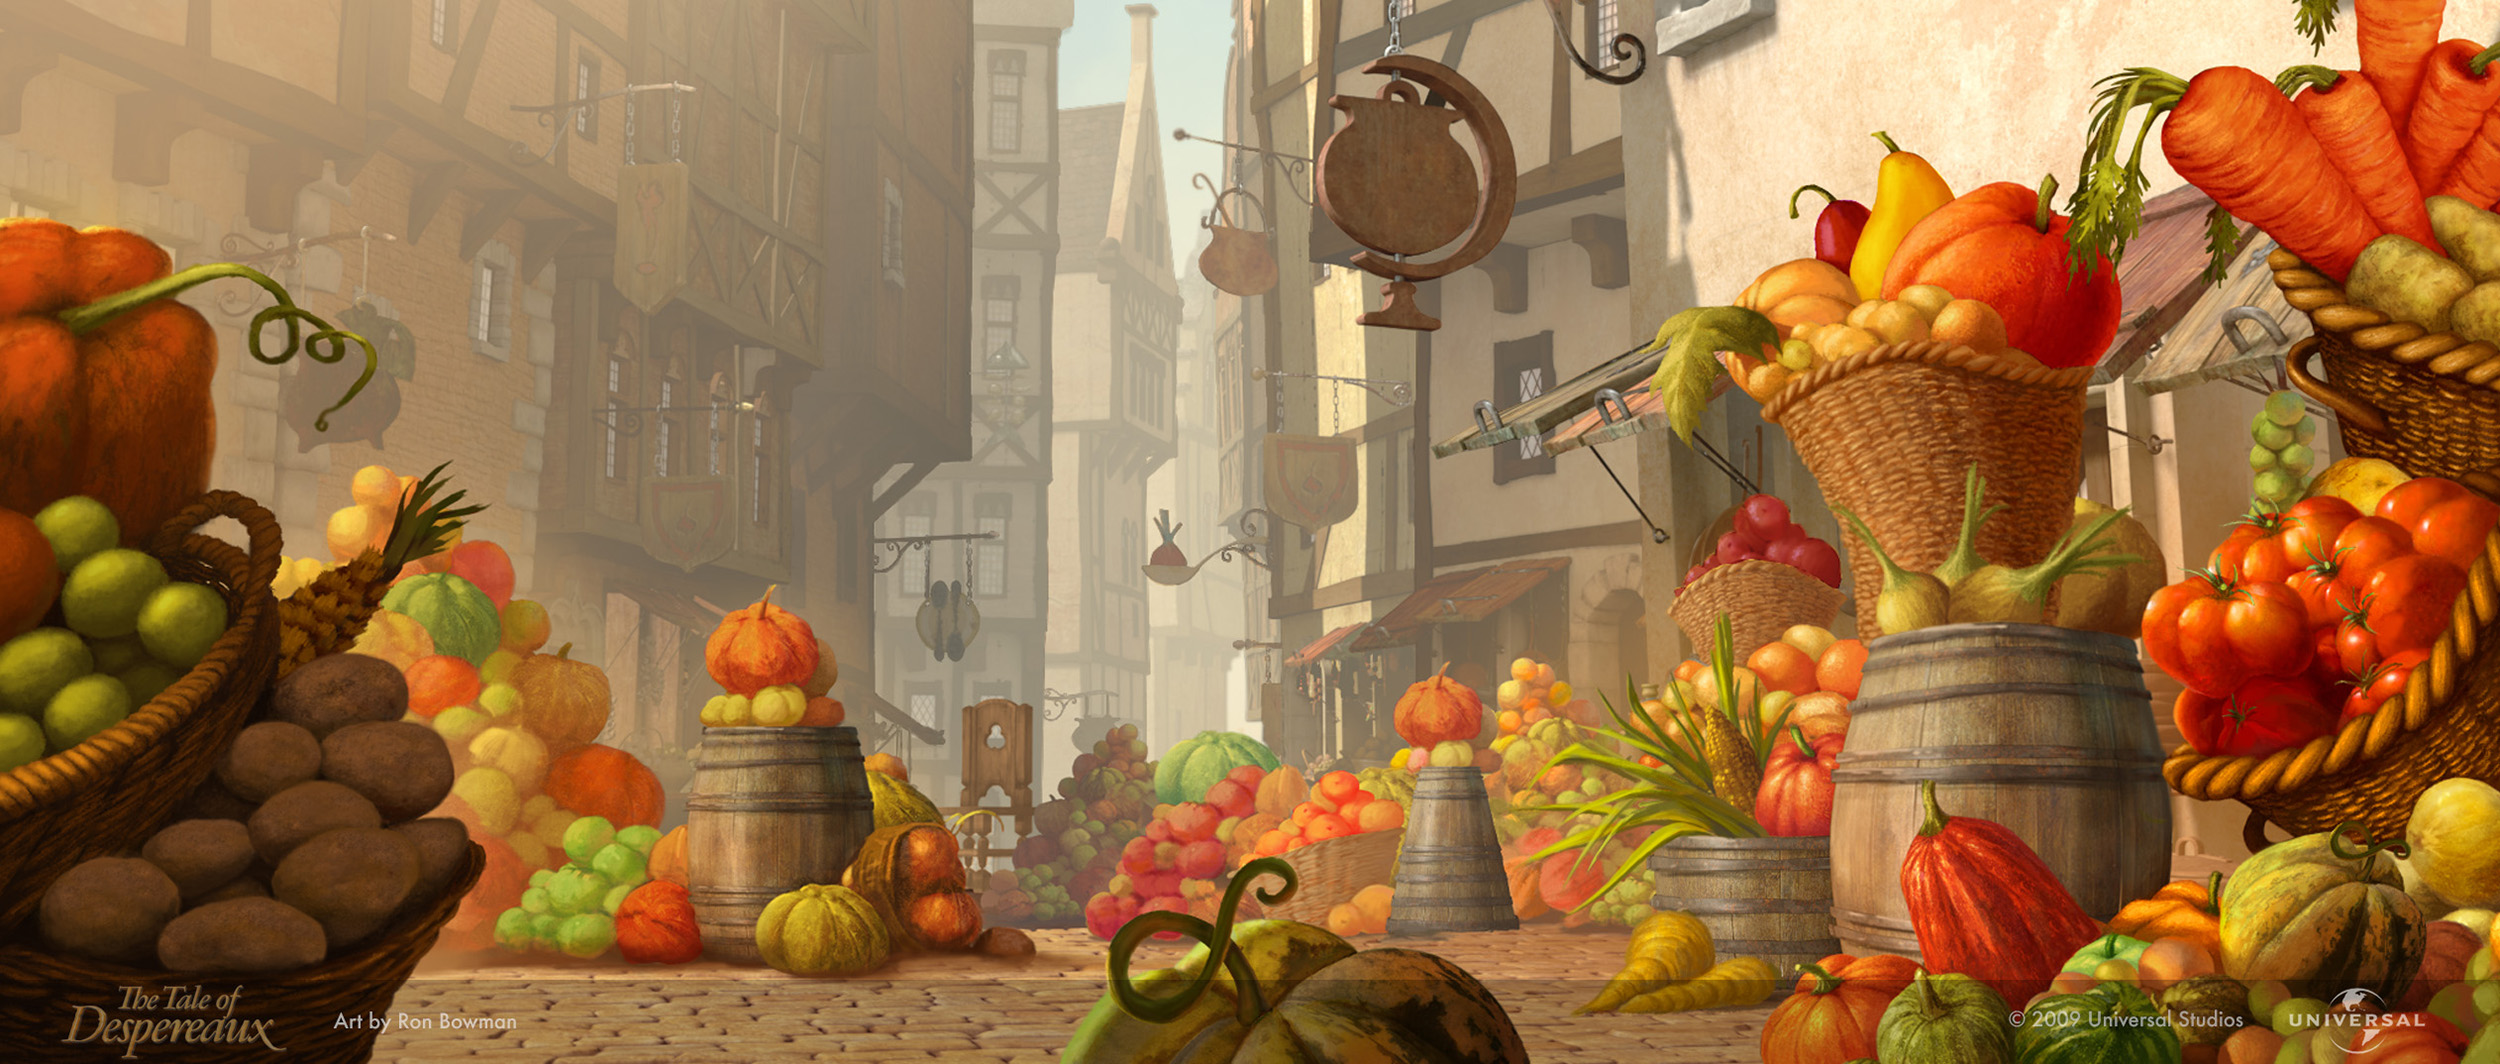 despereaux_fruit_street.jpg